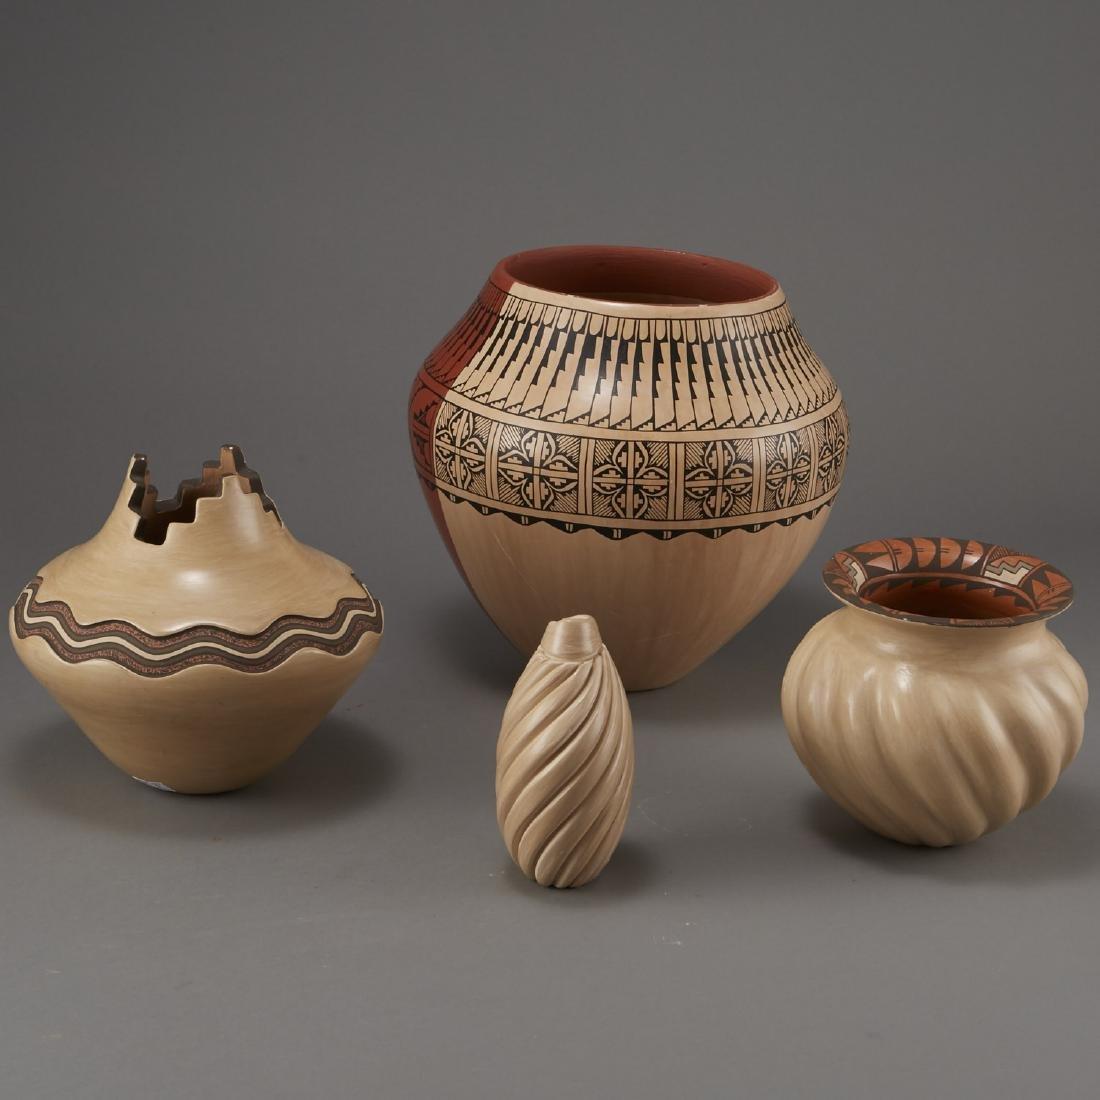 Group of Jemez Pottery Yepa and Fragua - 2